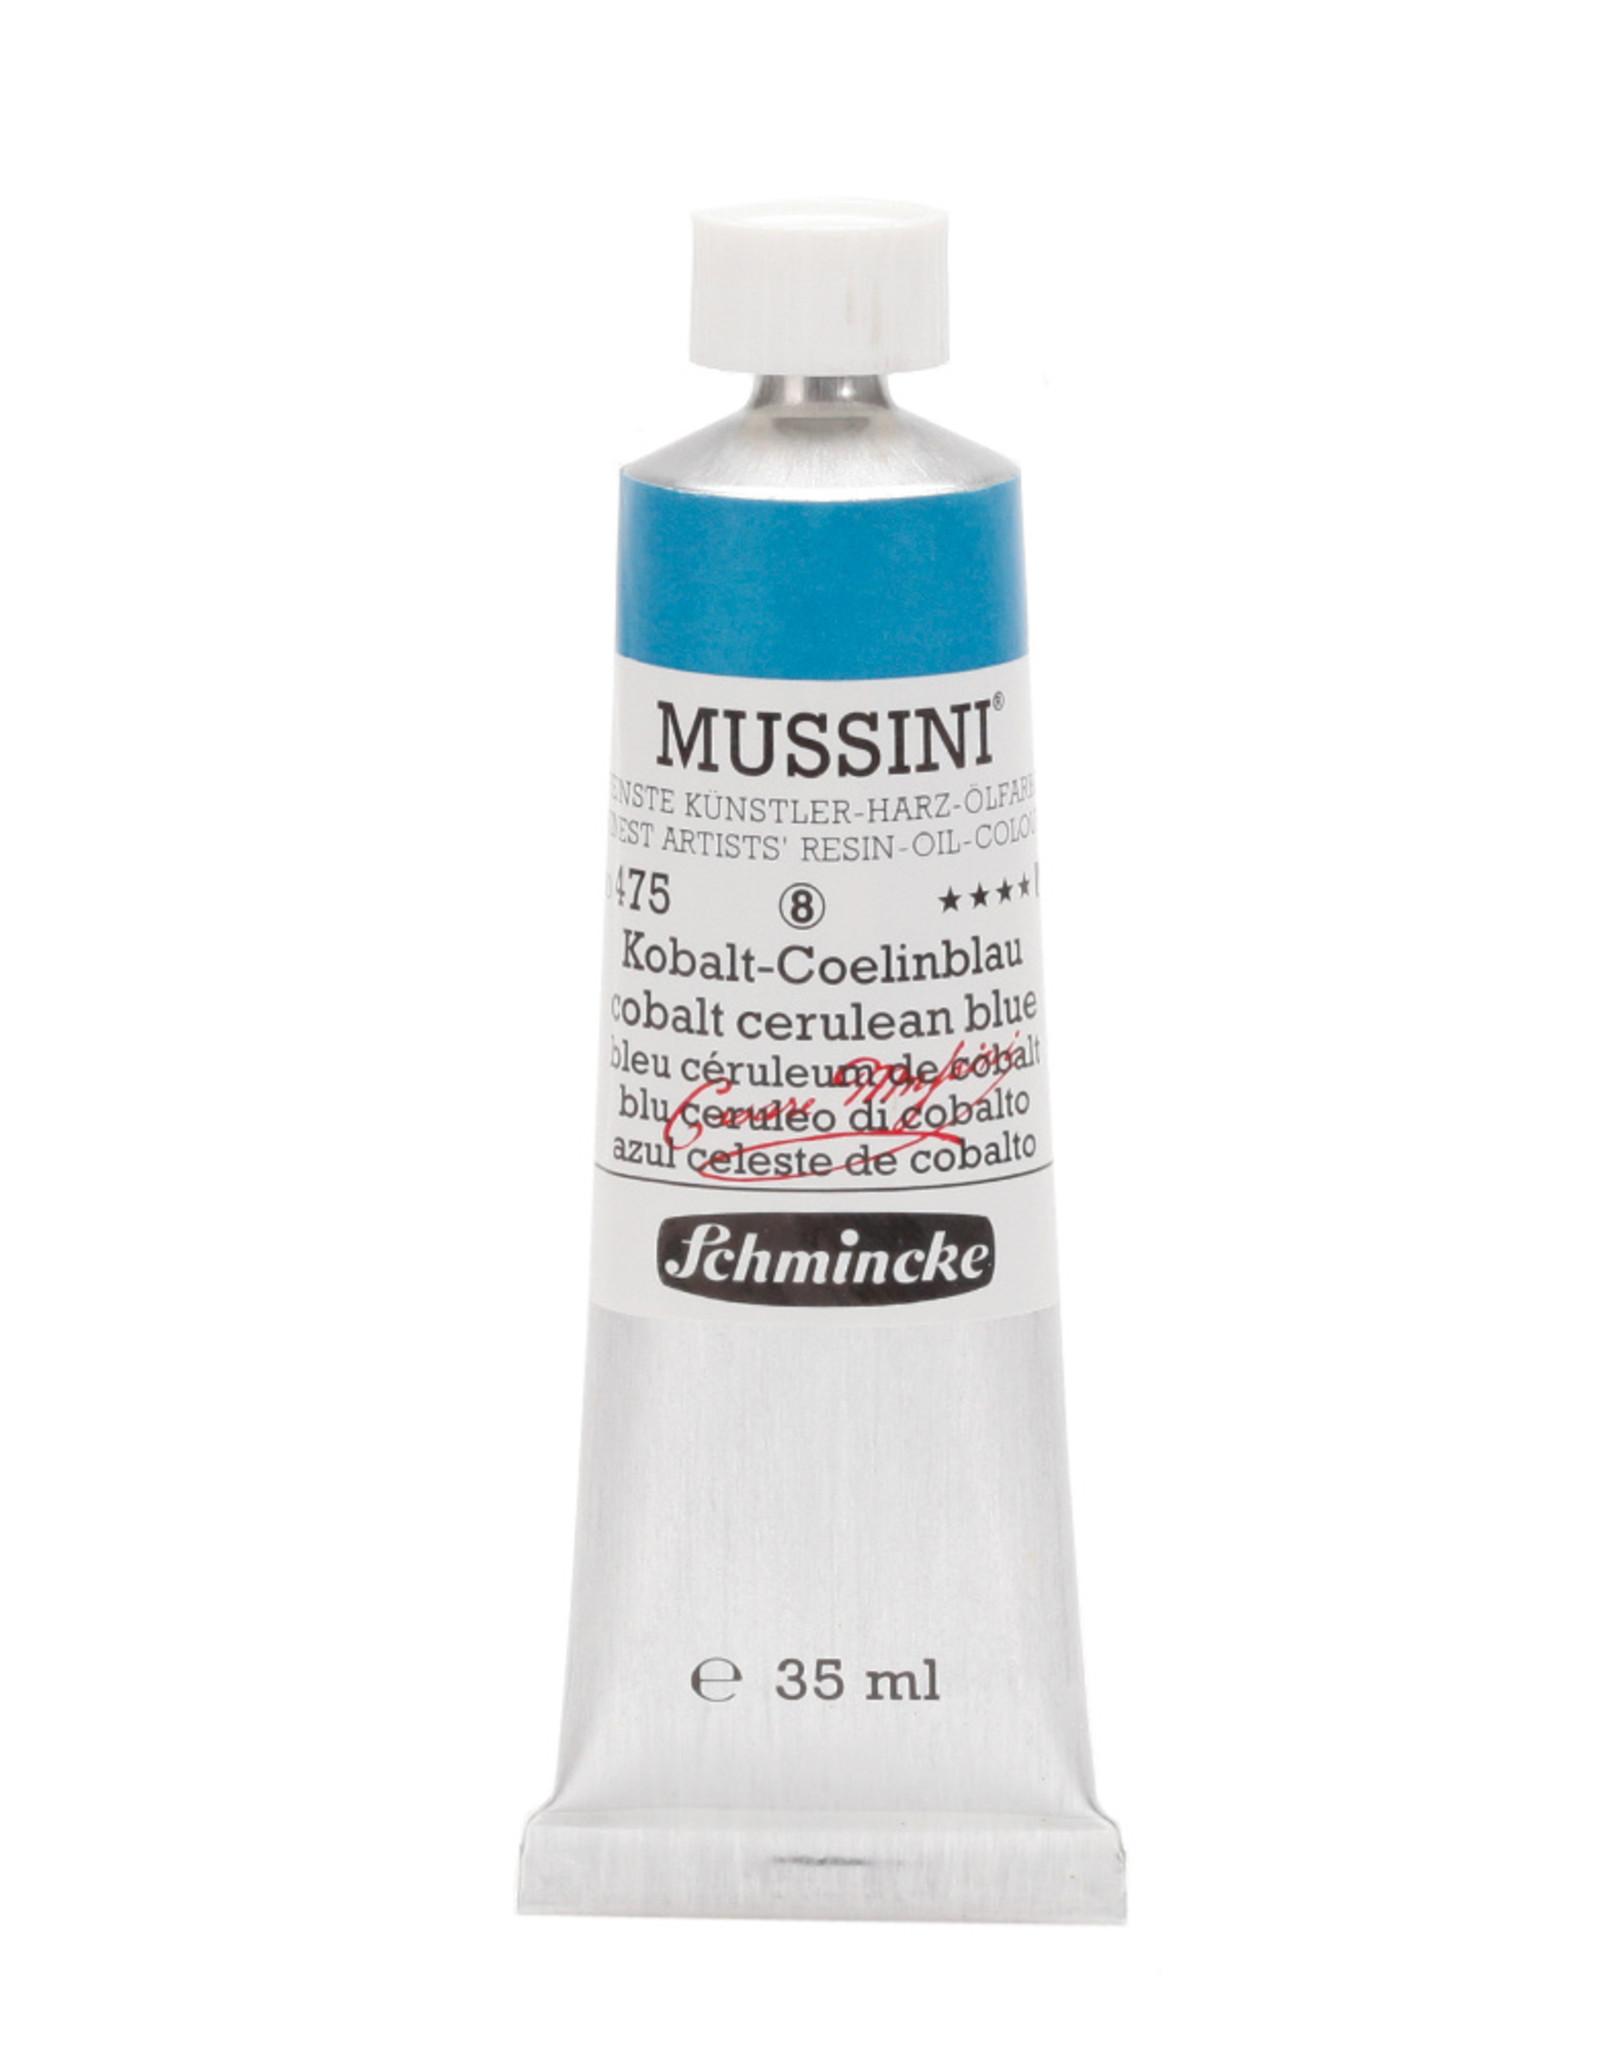 Schmincke Olieverf Mussini 35 ml Blauw Ceruleum Kobalt 475/8